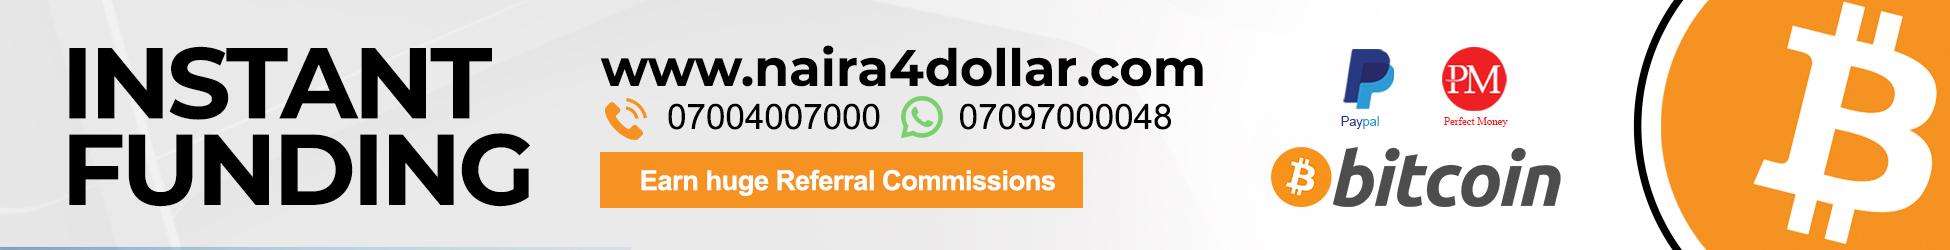 Naira4Dollar